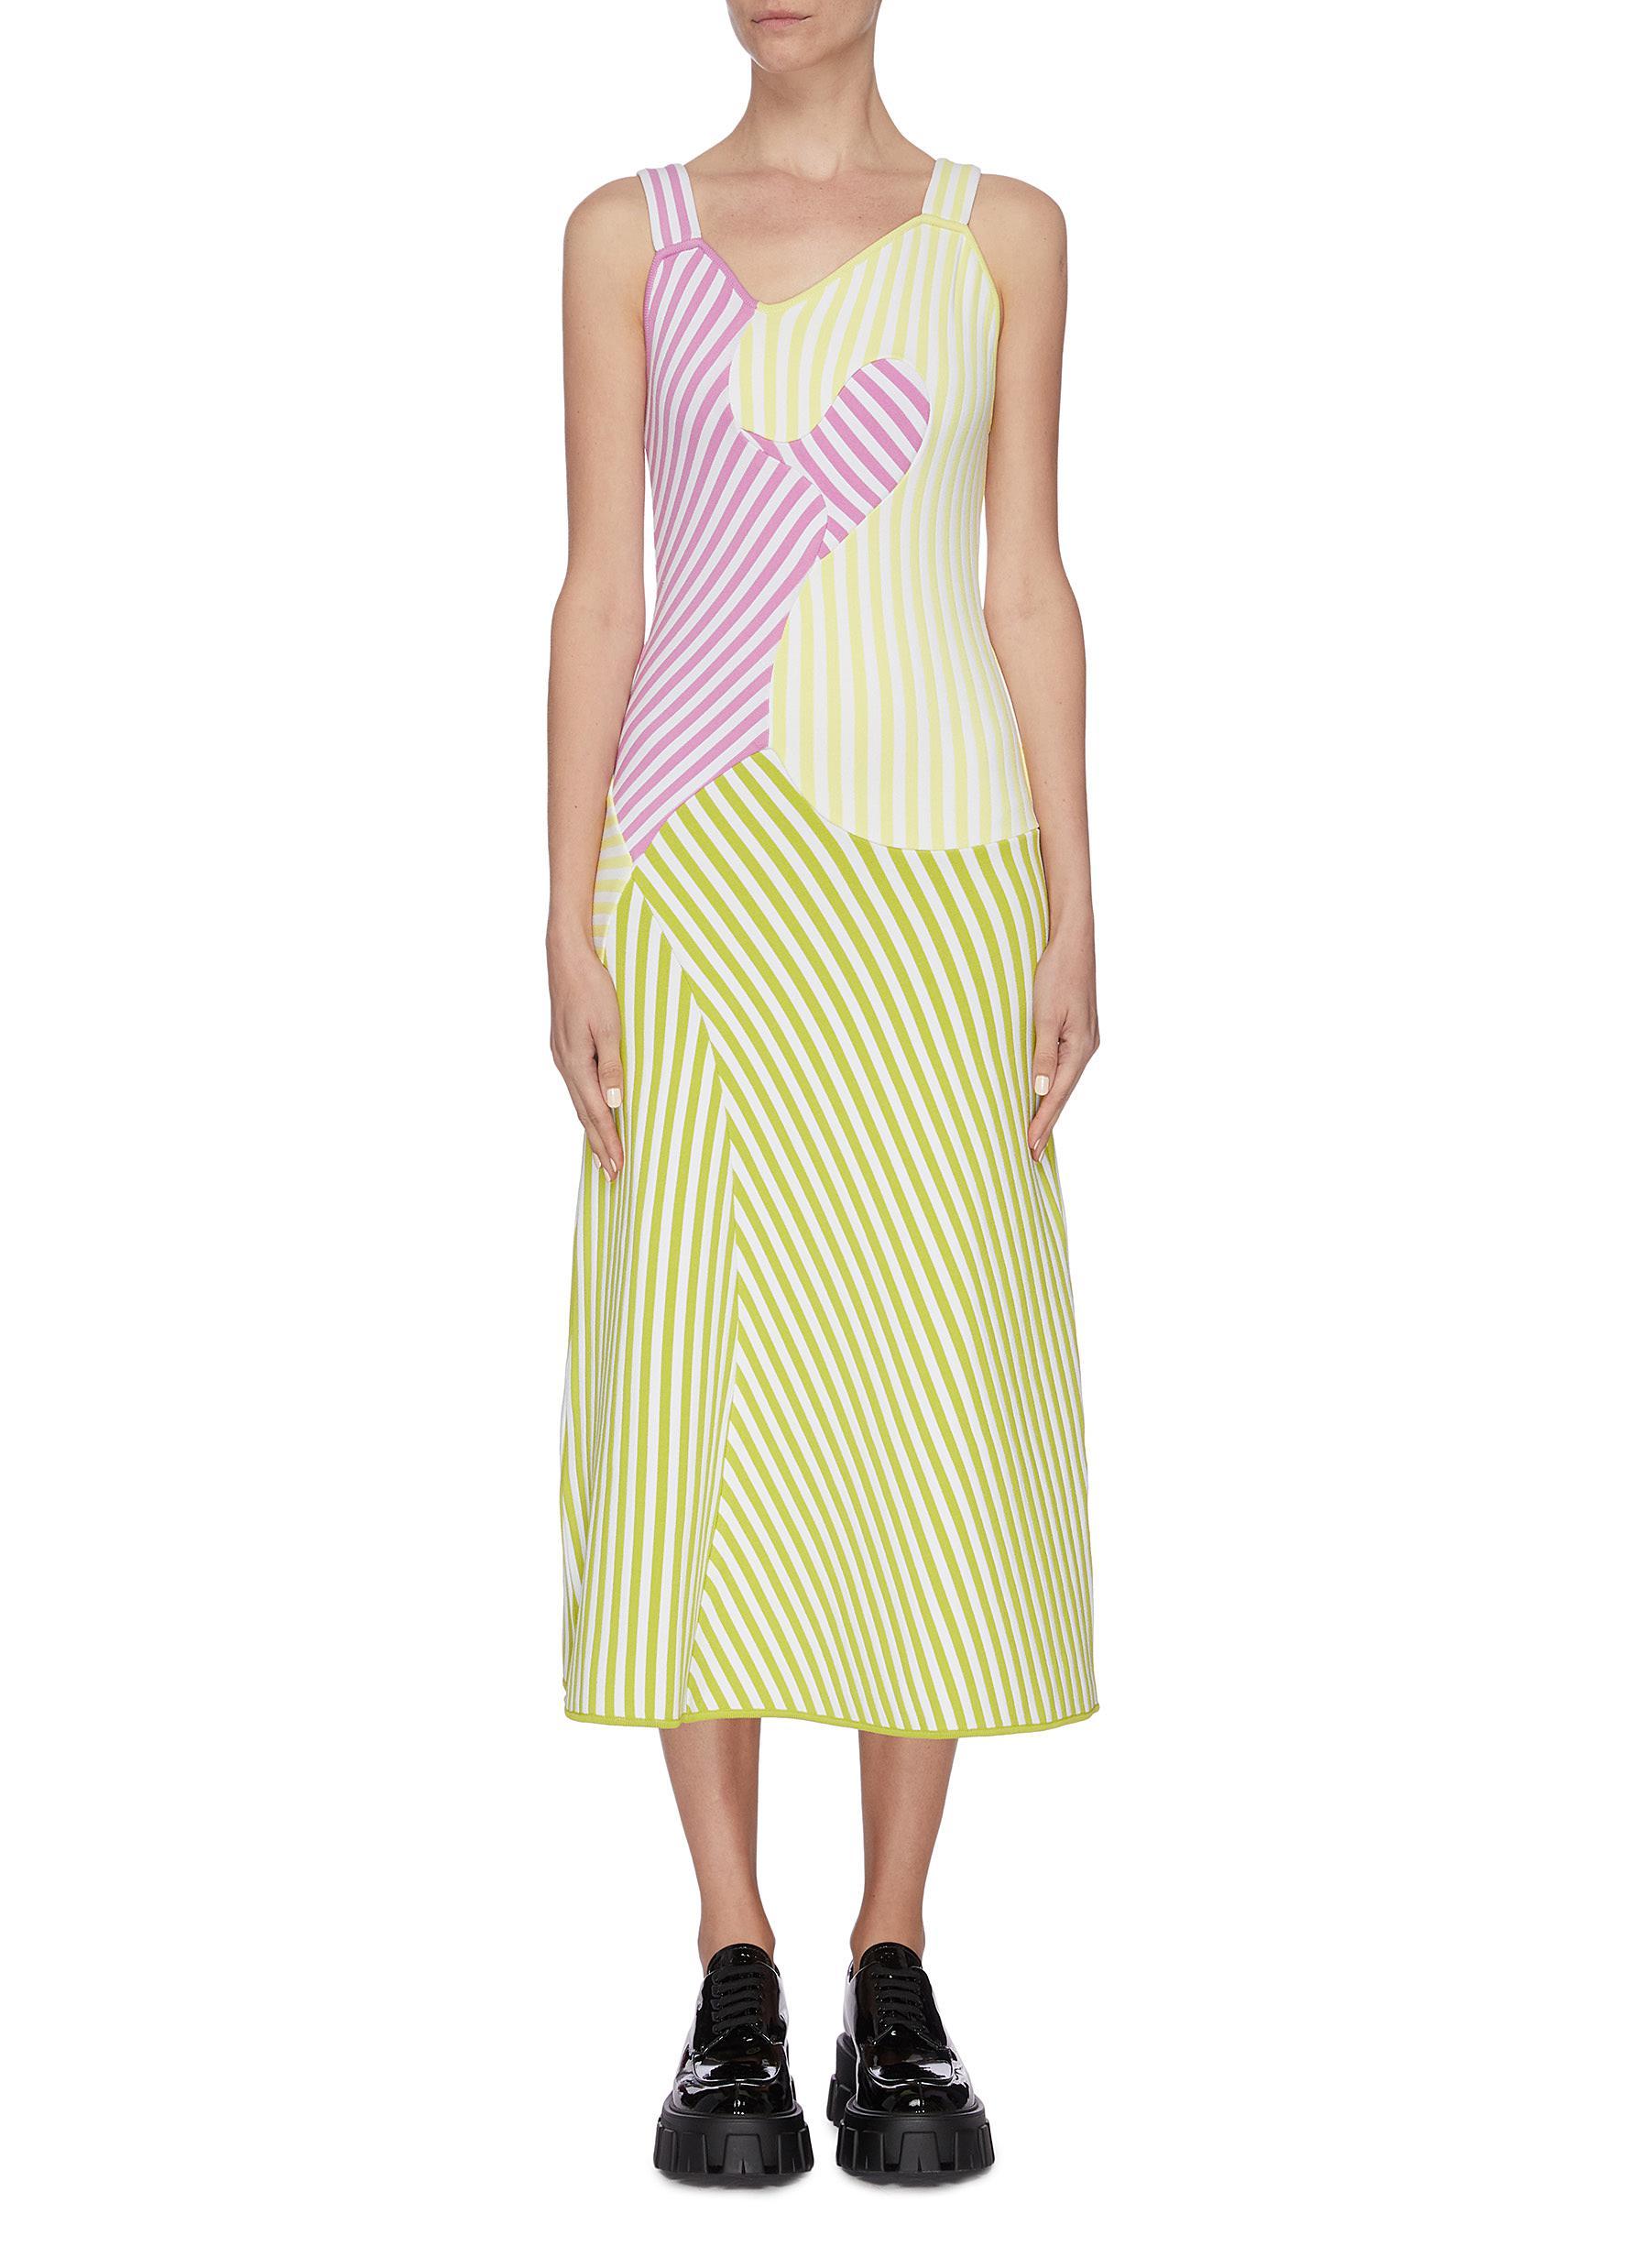 Buy Ph5 Dresses 'Talia' wave print stripe colourblock dress